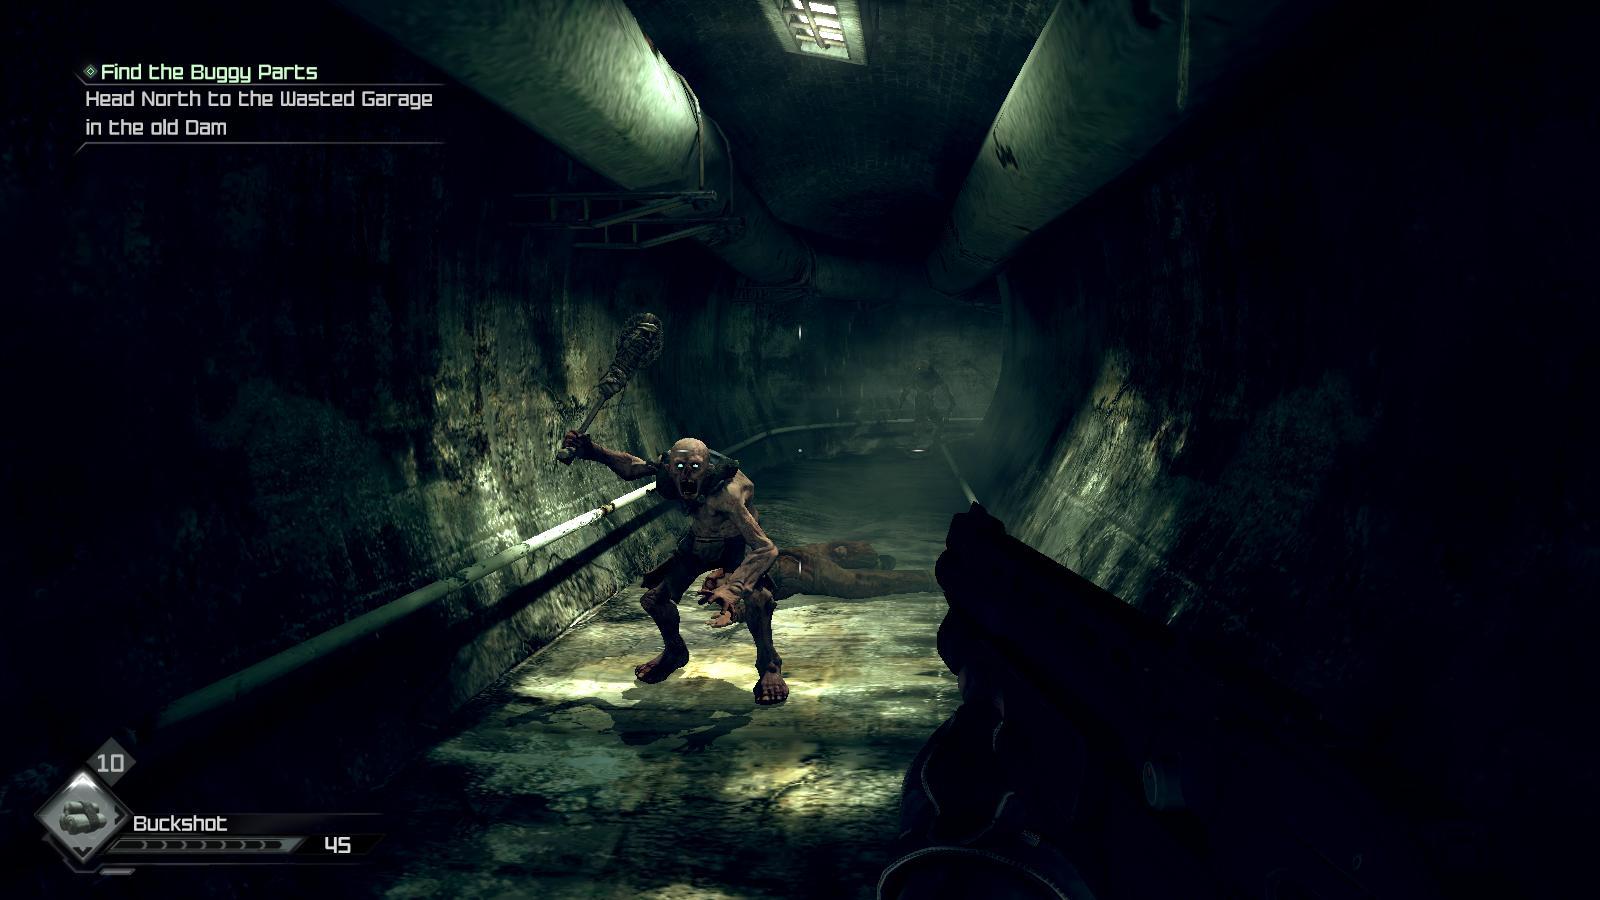 Doom 3 Updates For Windows 7 Wallpaperceleb Esy. . Es Hot Celebrity Wallpa